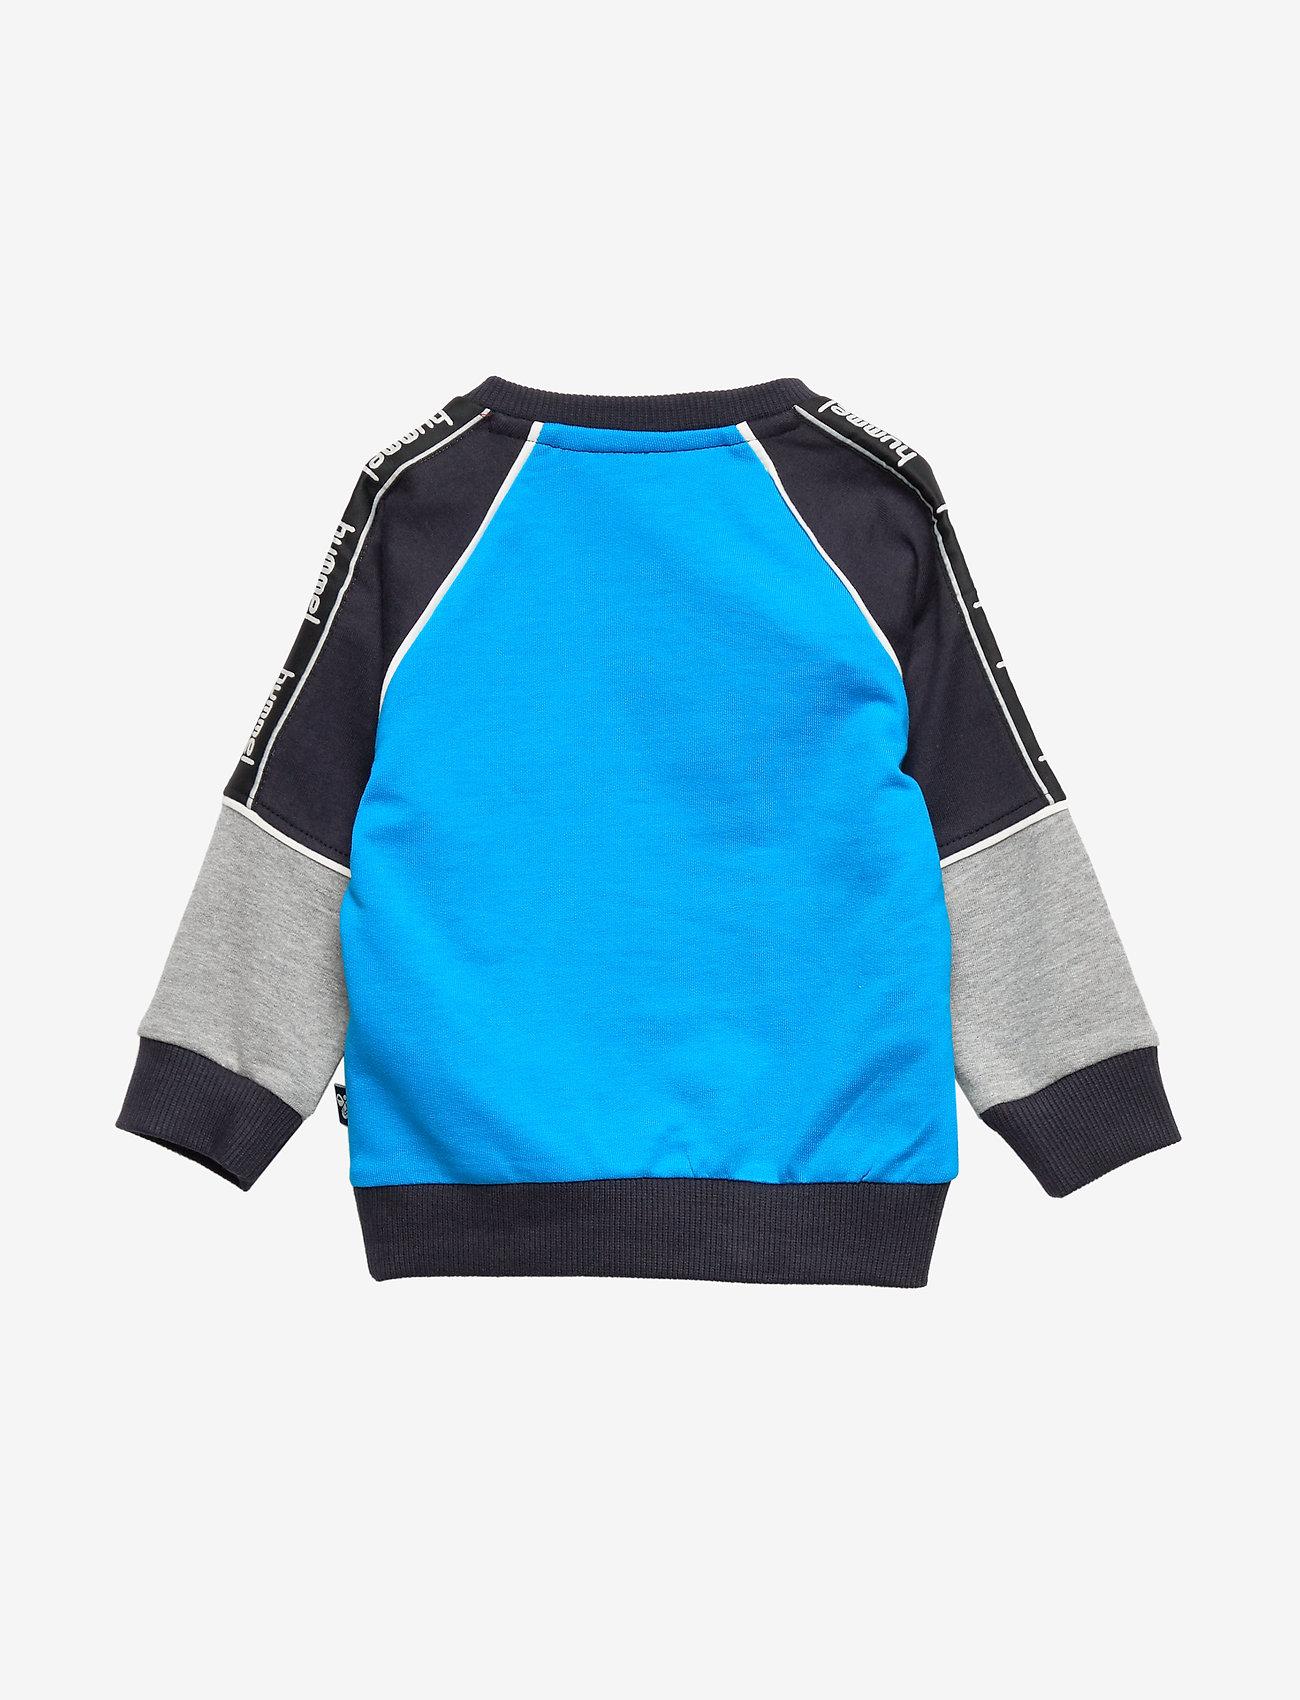 Hummel - hmlREADY SWEATSHIRT - sweats - diva blue